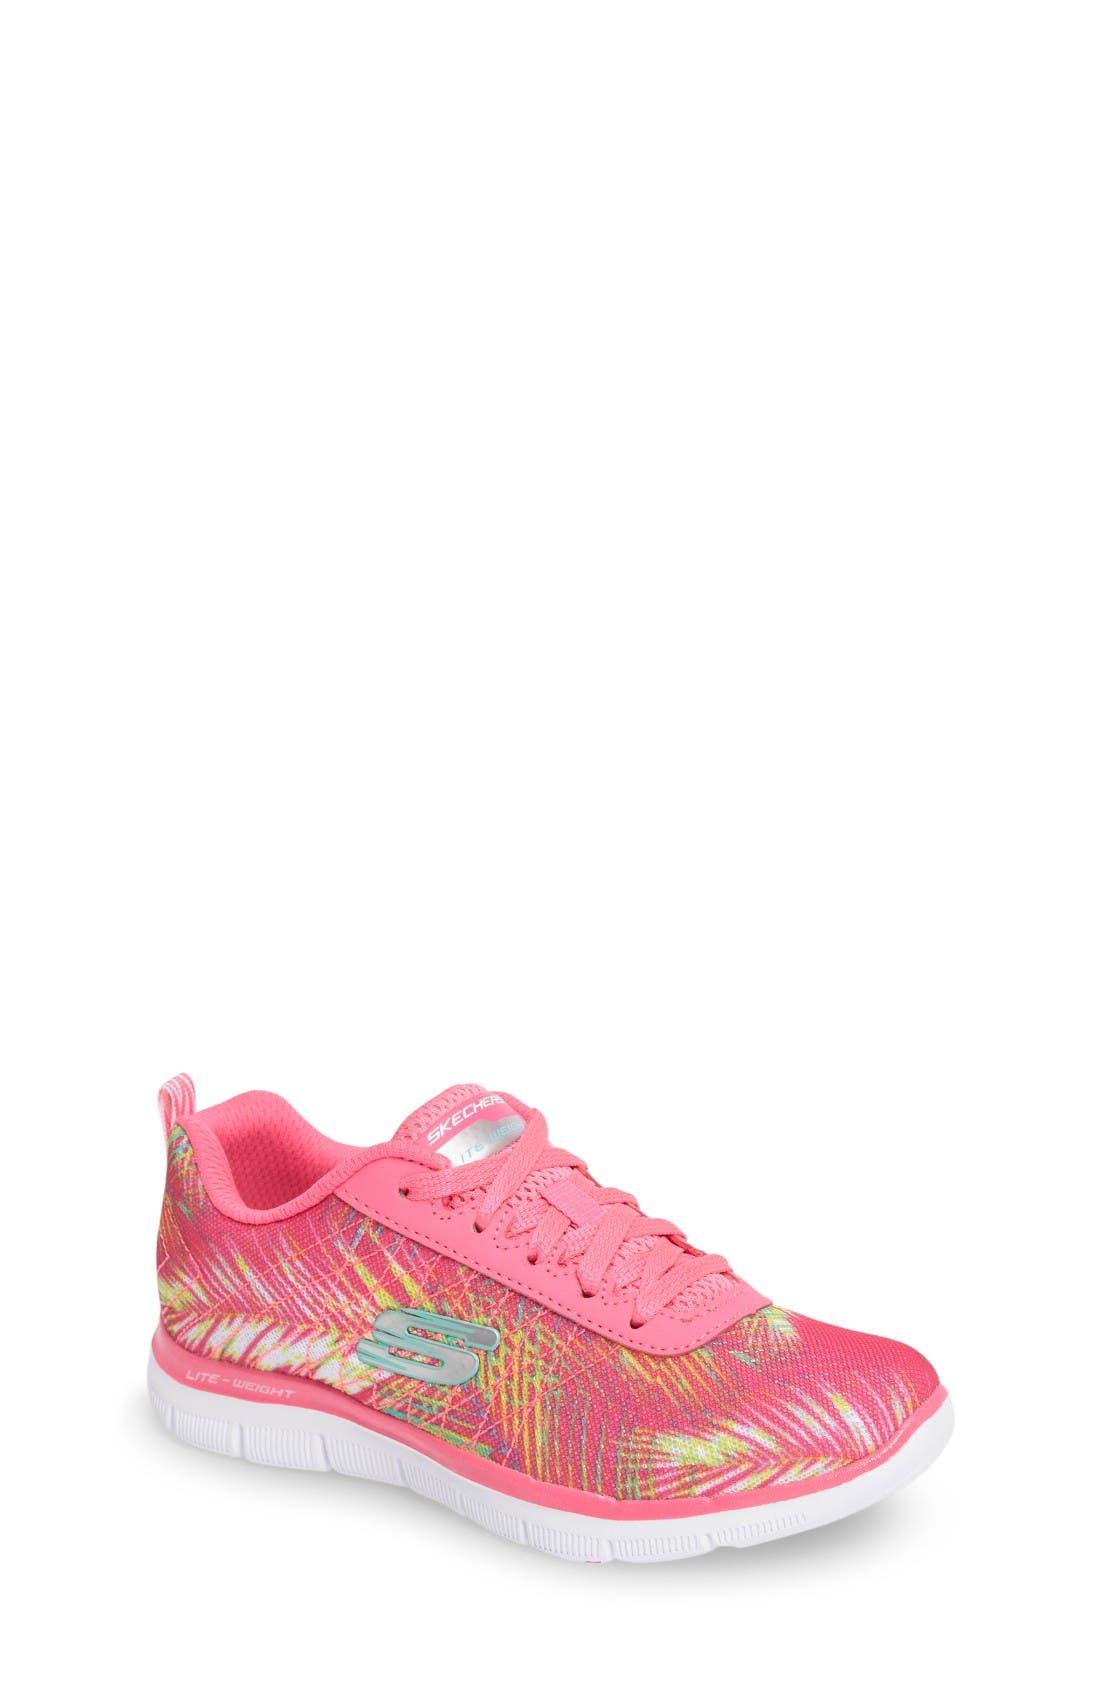 SKECHERS Skech Appeal 2.0 Tropical Breeze Sneaker (Toddler, Little Kid & Big Kid)